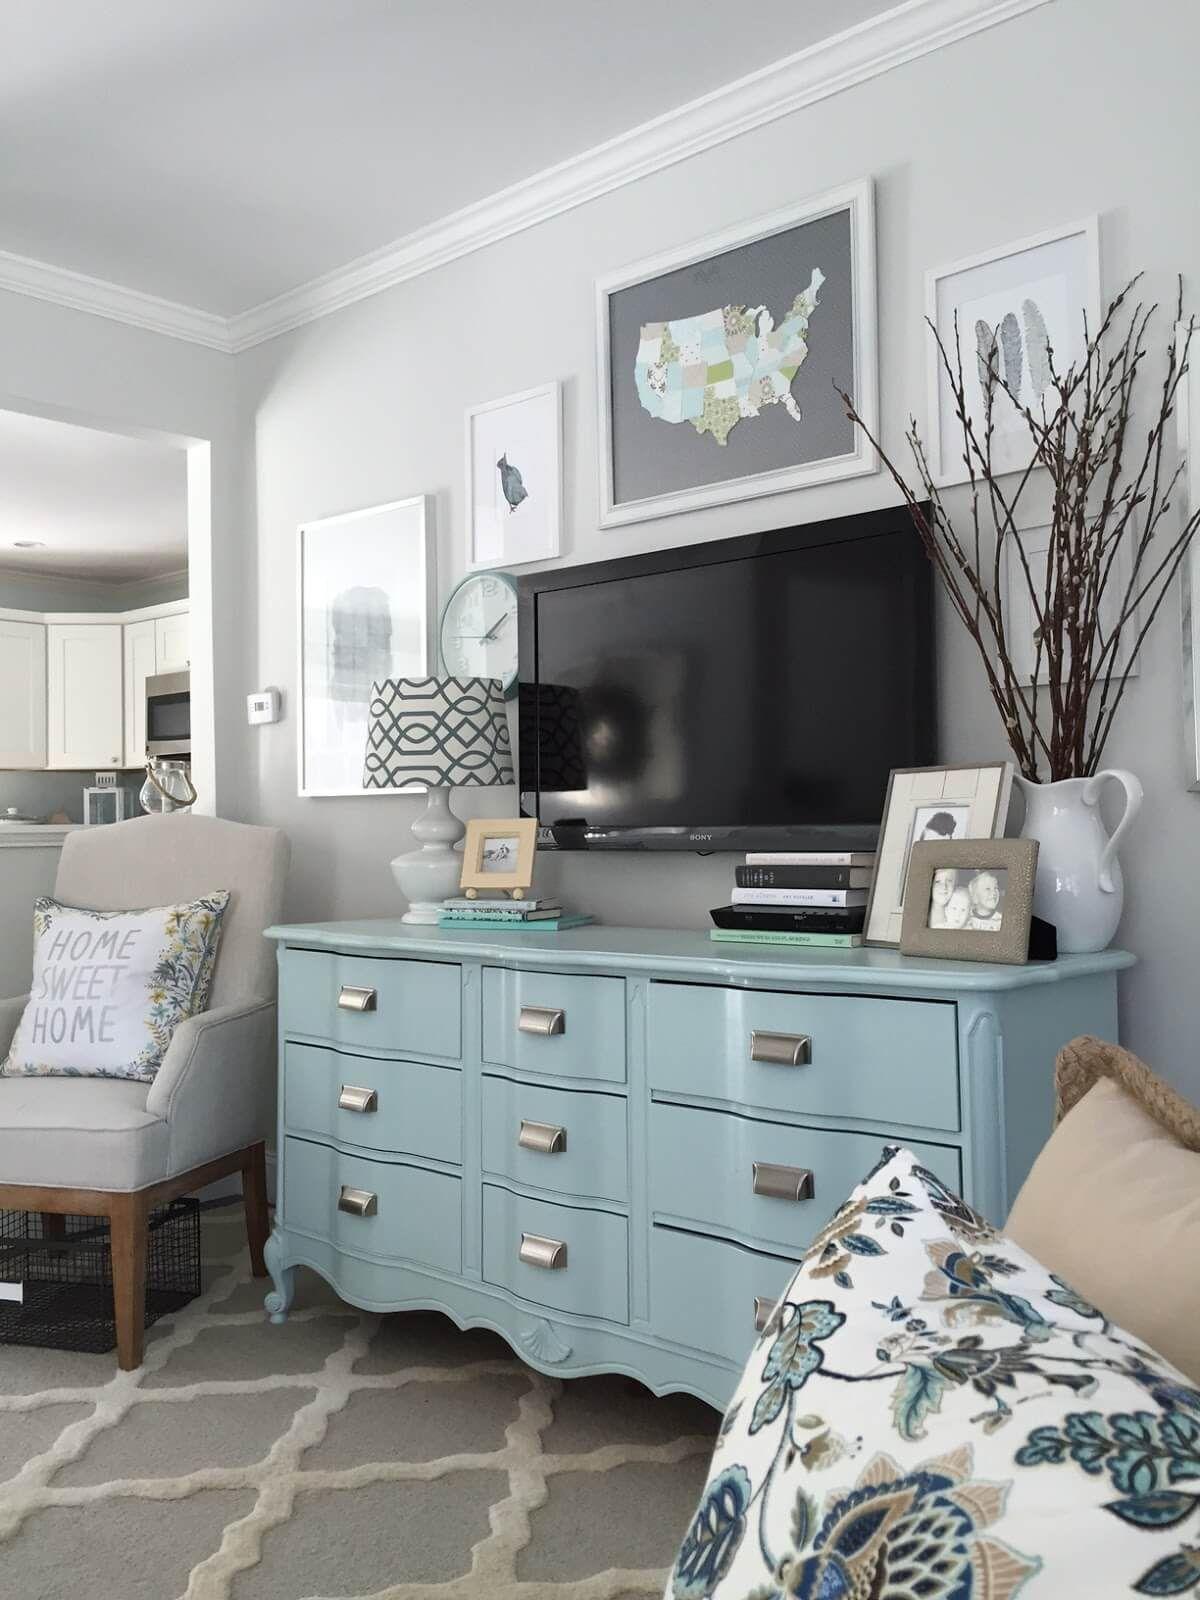 Cool decorate on  budget dime ideas  dutchman home decor chandni patel also best dhruvang images rh pinterest